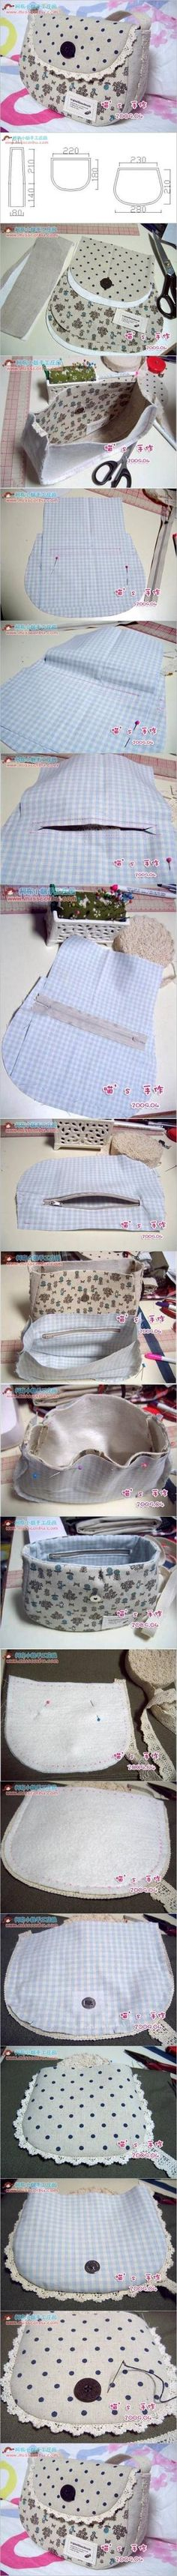 DIY How to Sew a Simple Summer Handbag by amandawest